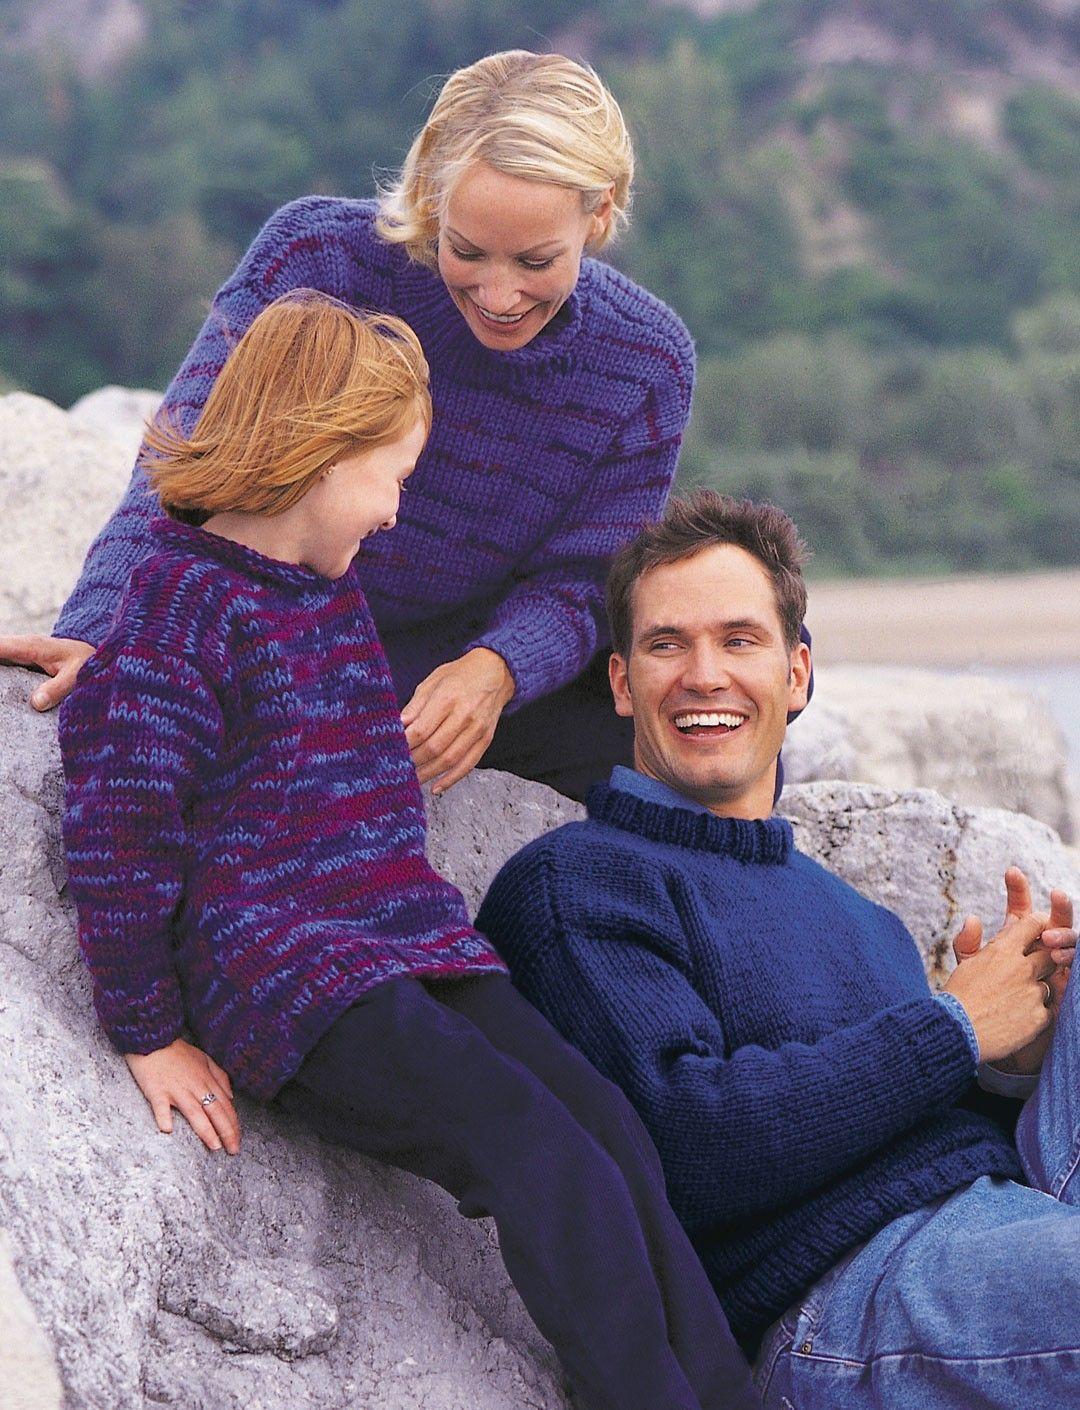 e596f913c Yarnspirations.com - Patons Big-Stitch Pullover (child) - Patterns ...